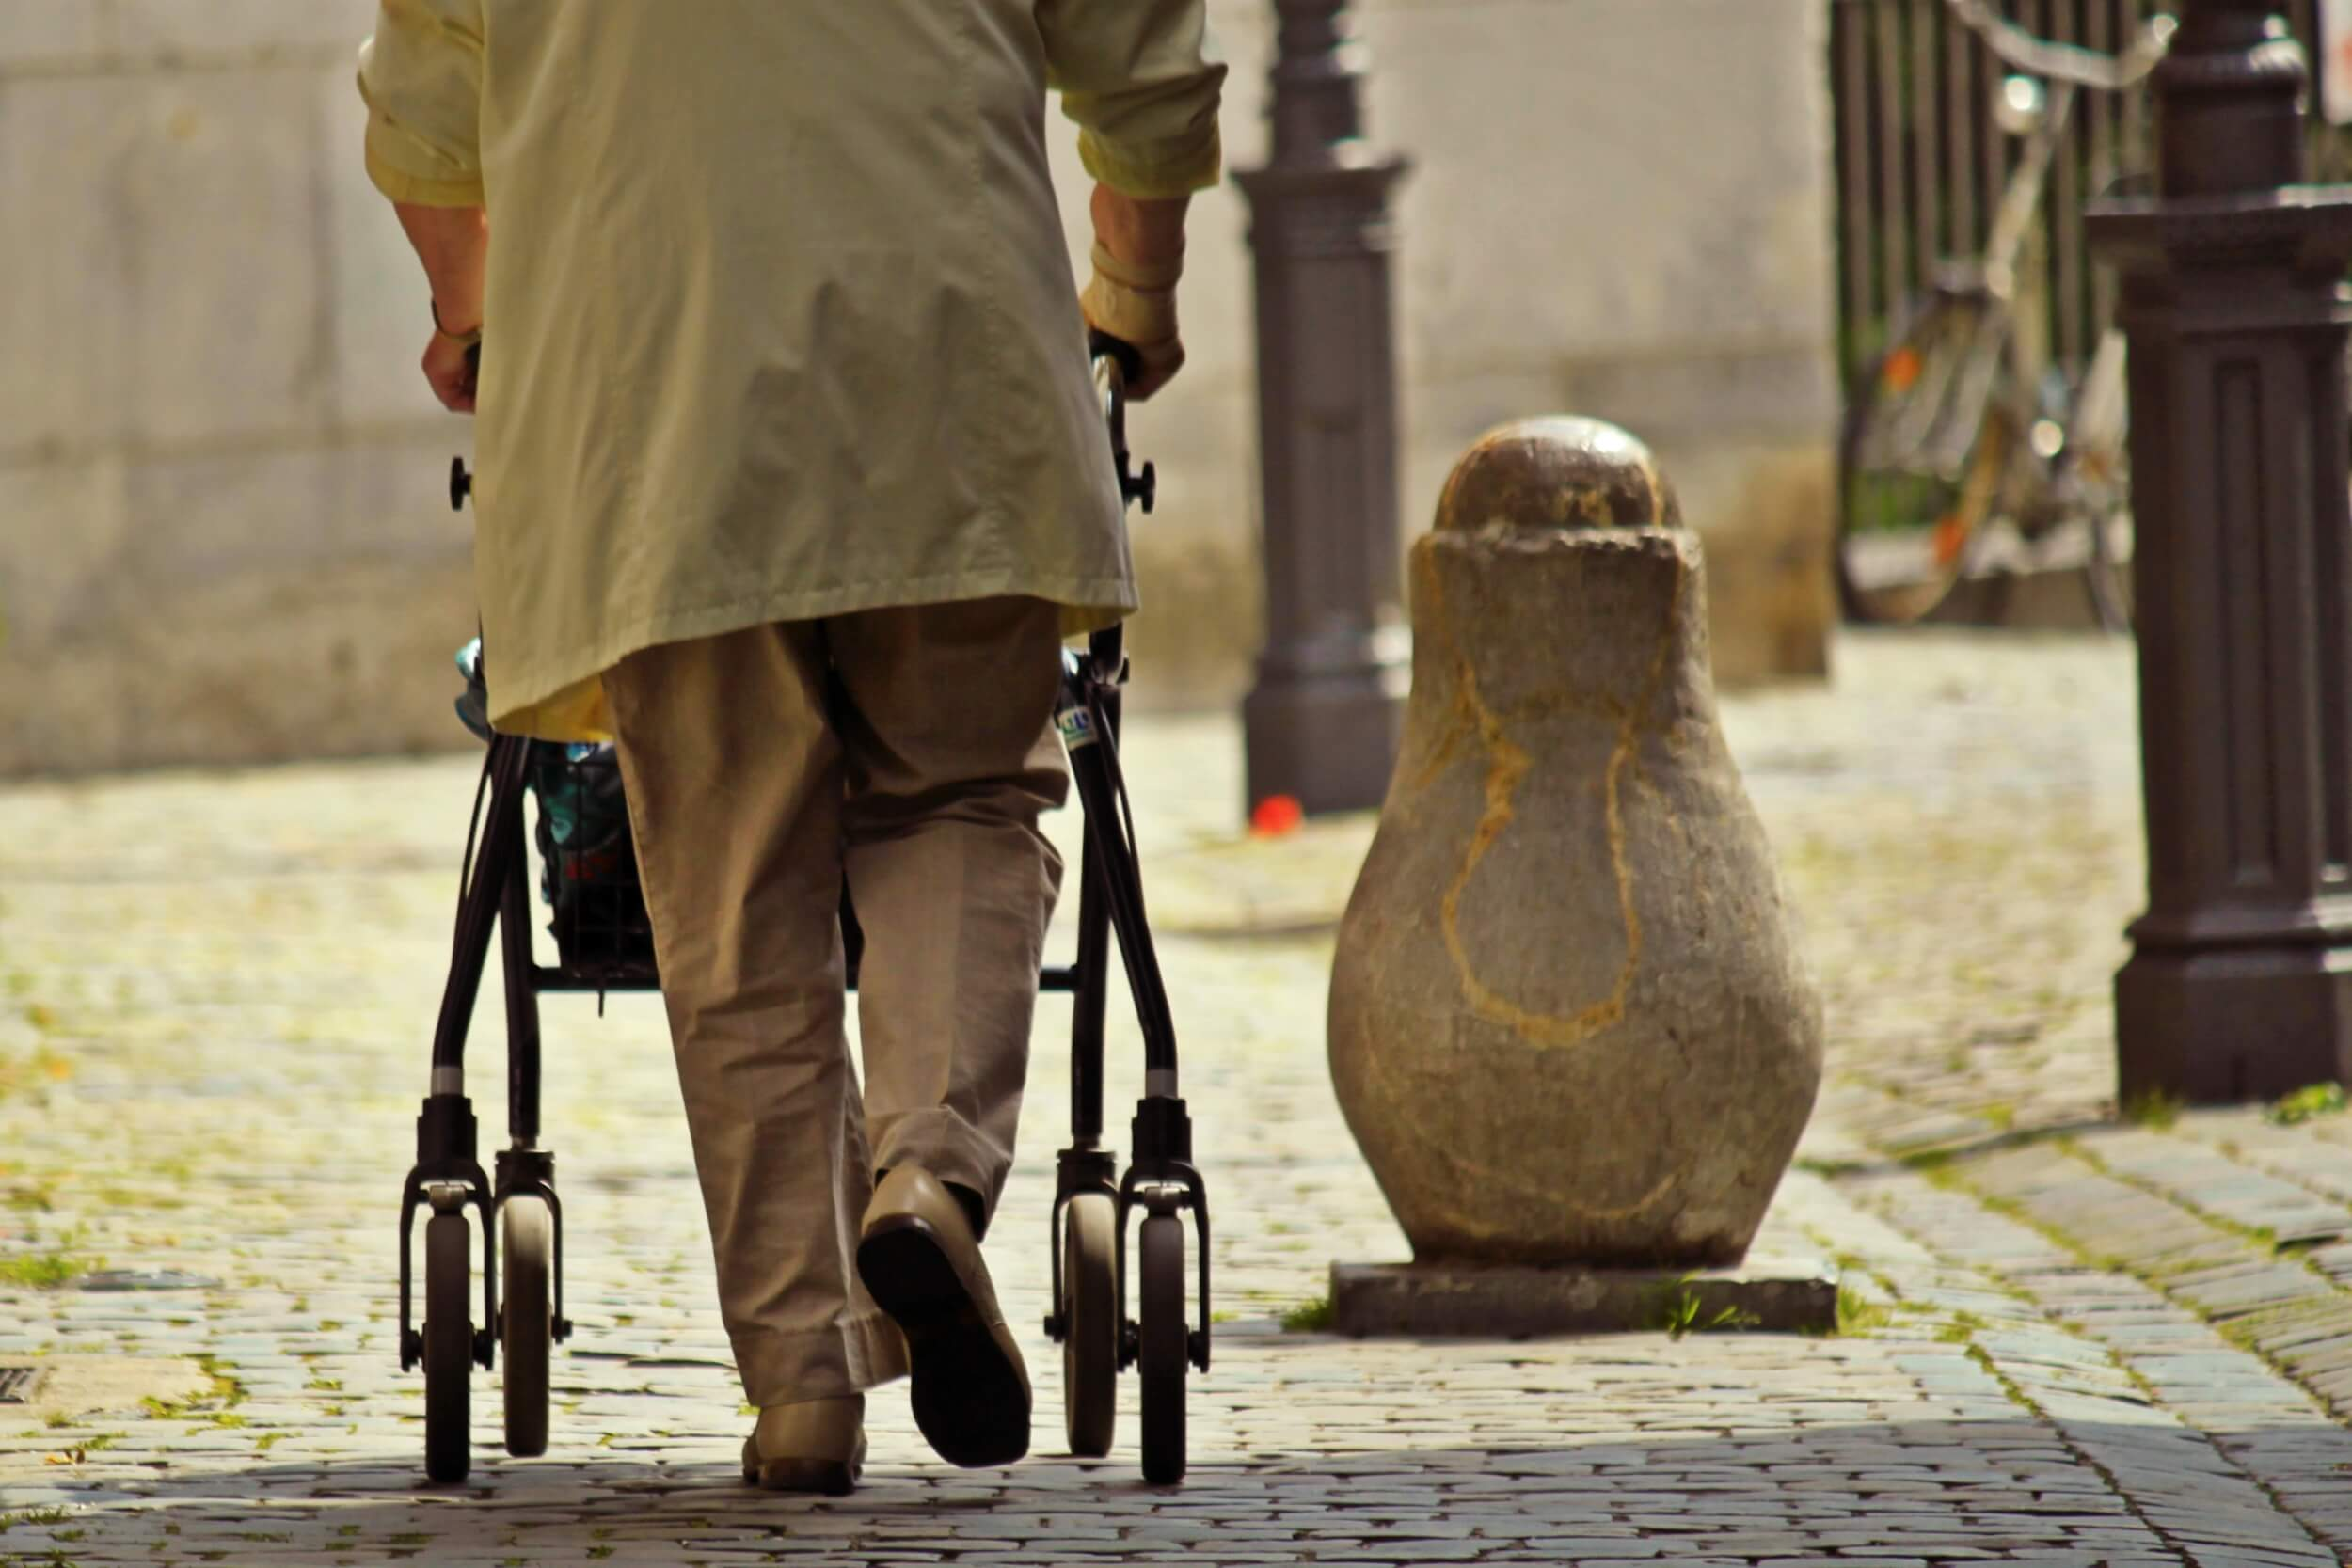 Pflege|Seniorin mit Rollator im Seniorenheim (c) cocoparisienne / pixabay.de